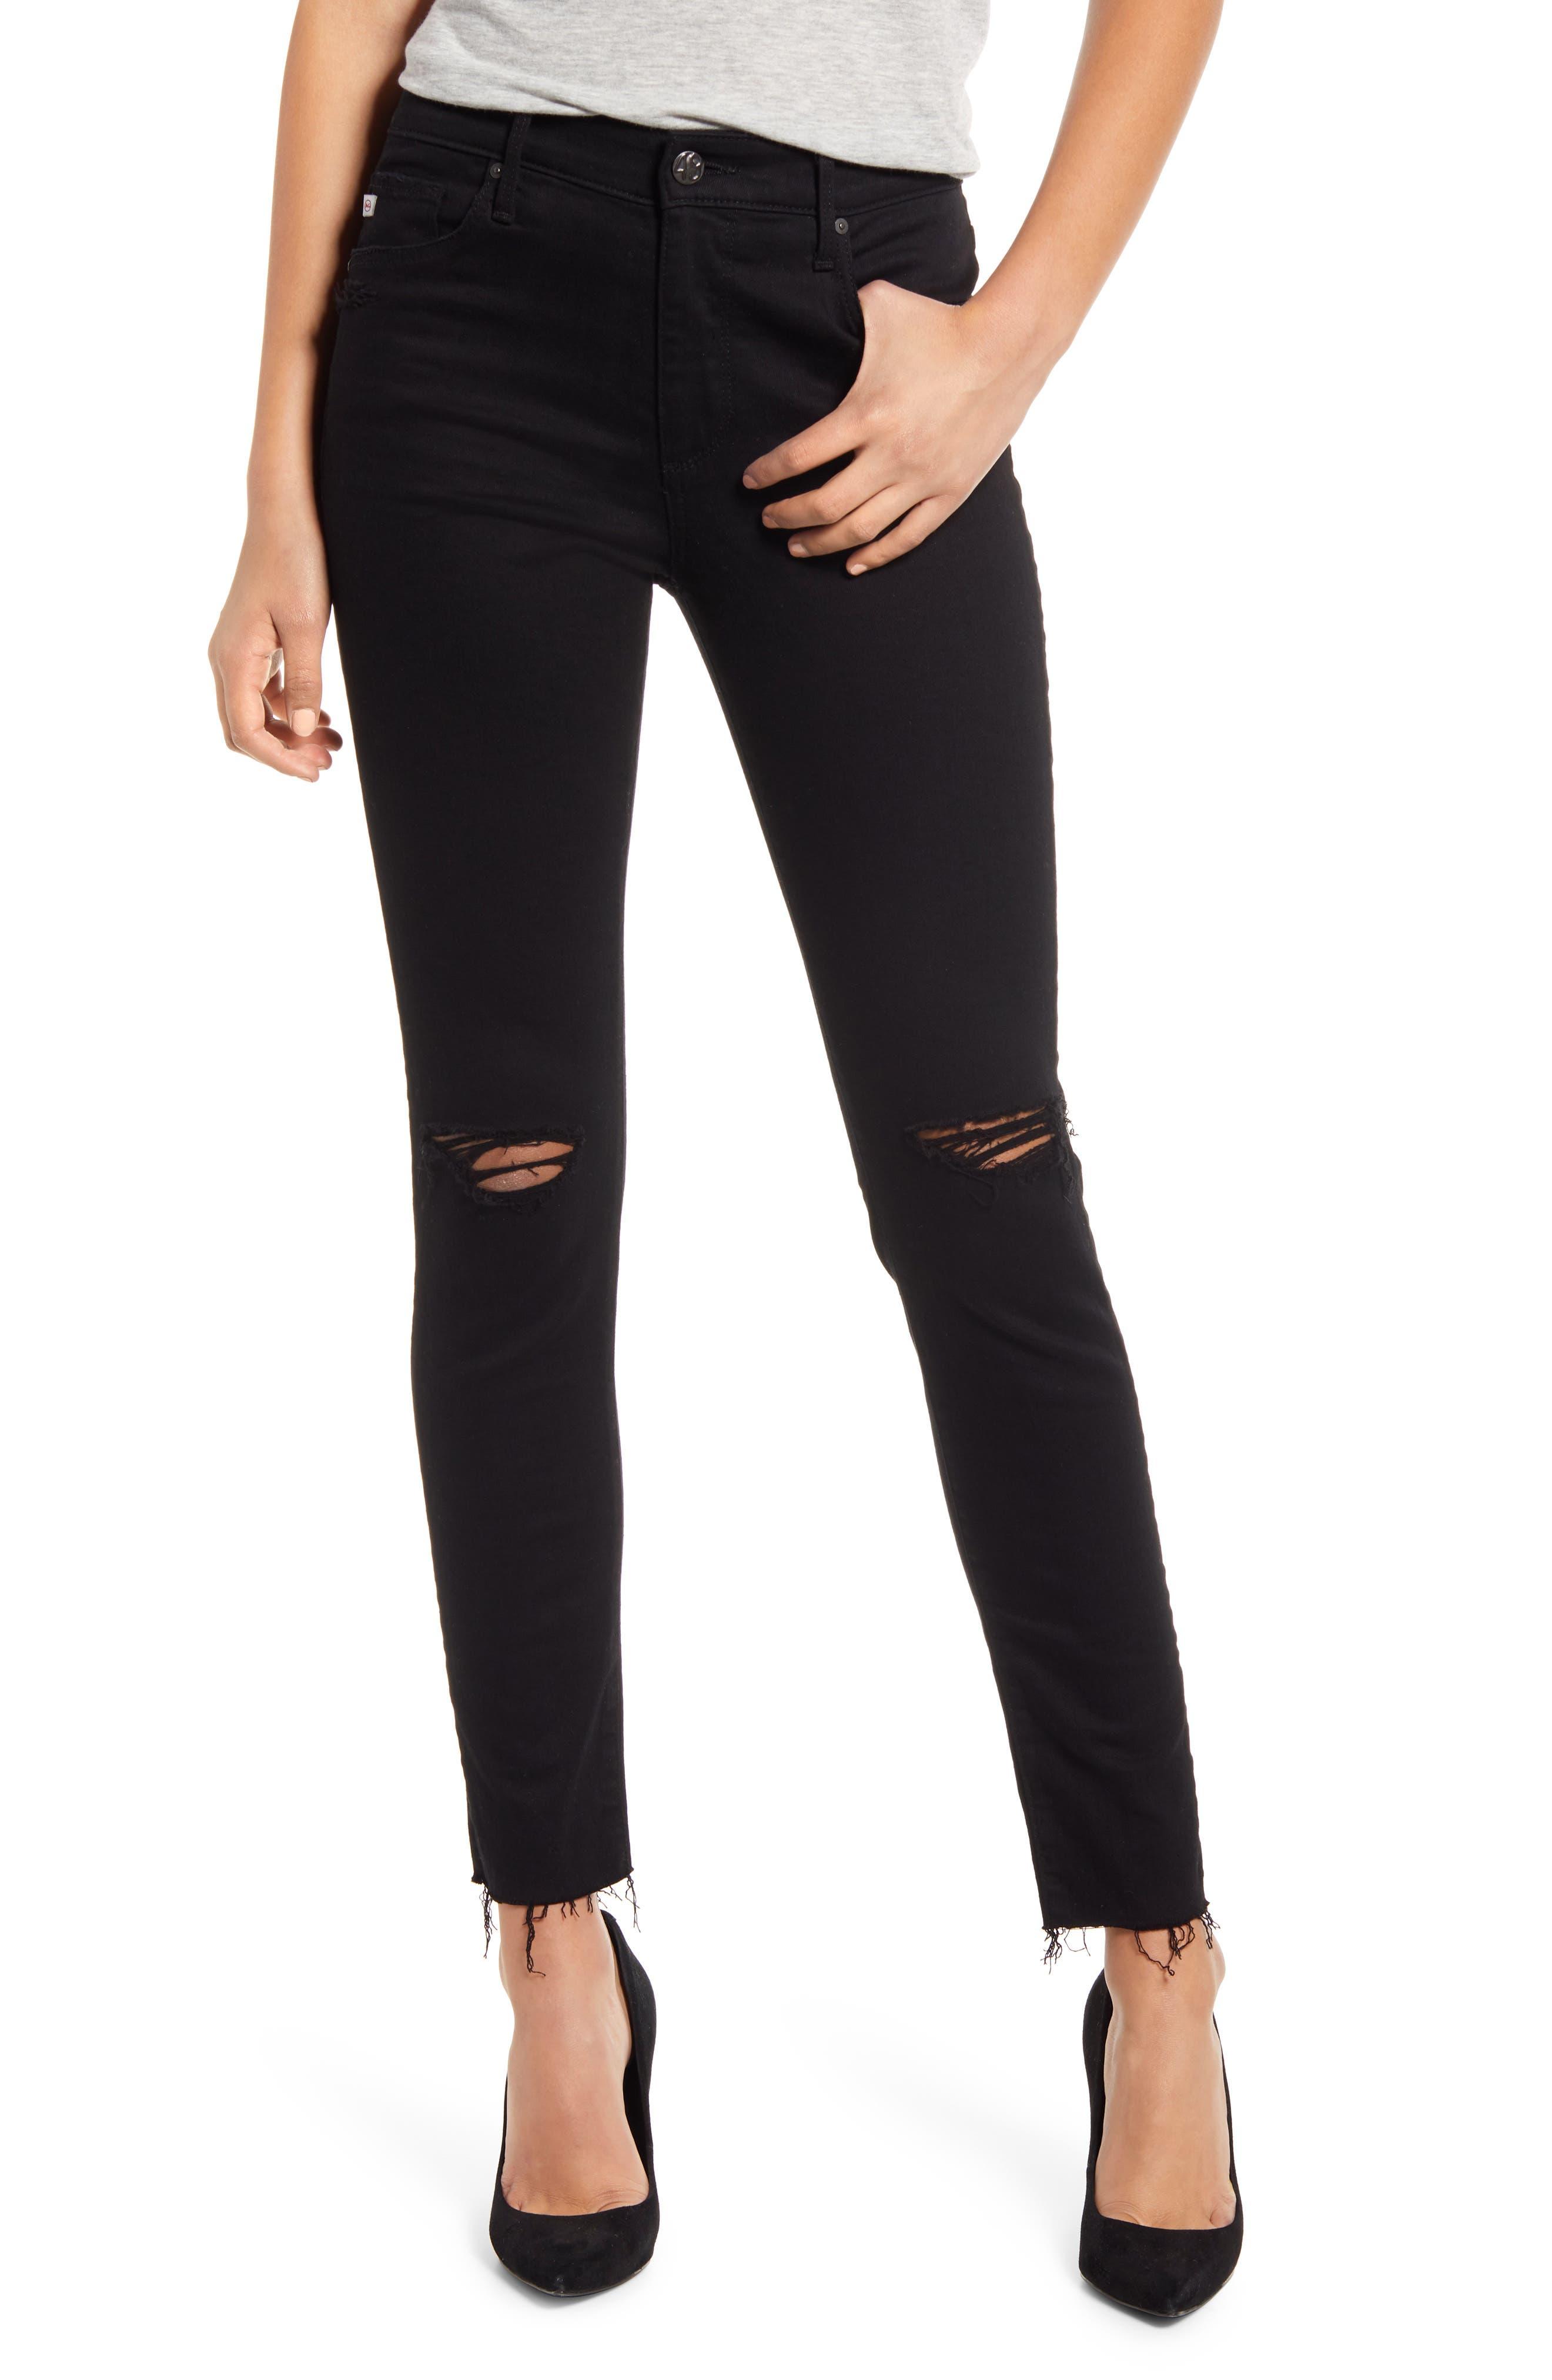 Women's AG The Farrah High Waist Raw Hem Ankle Skinny Jeans